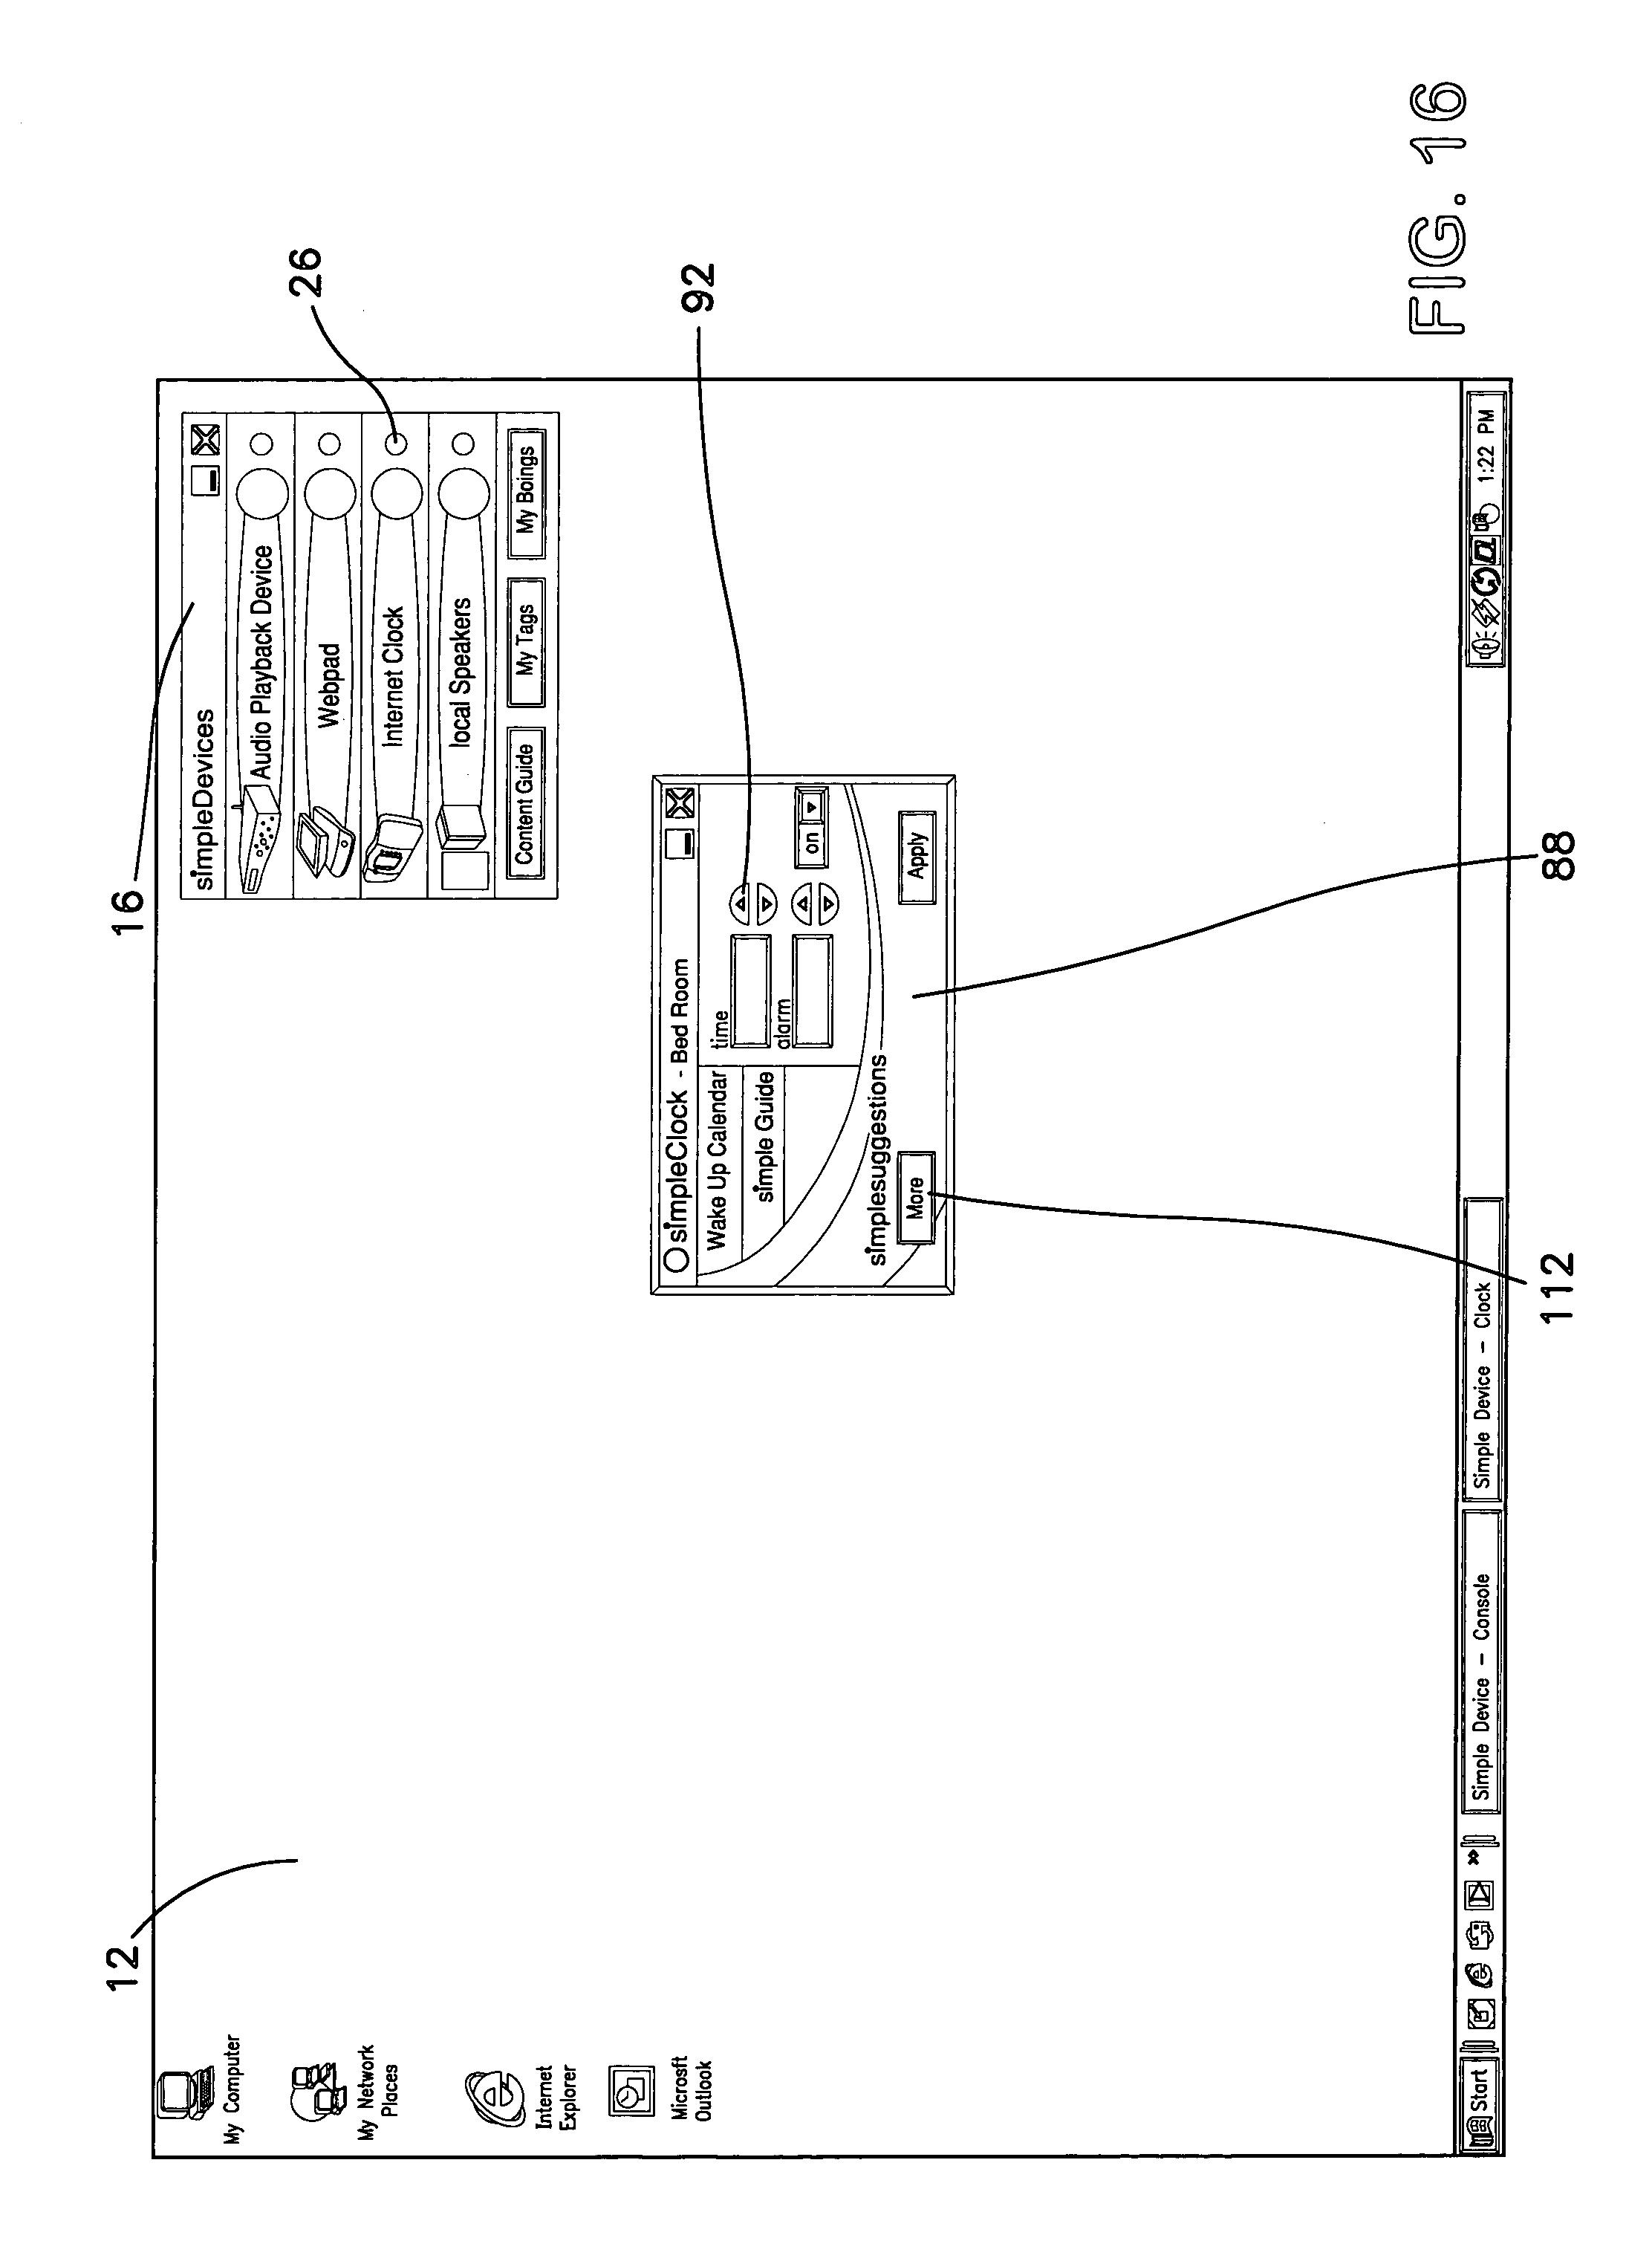 Patent US 7,130,616 B2